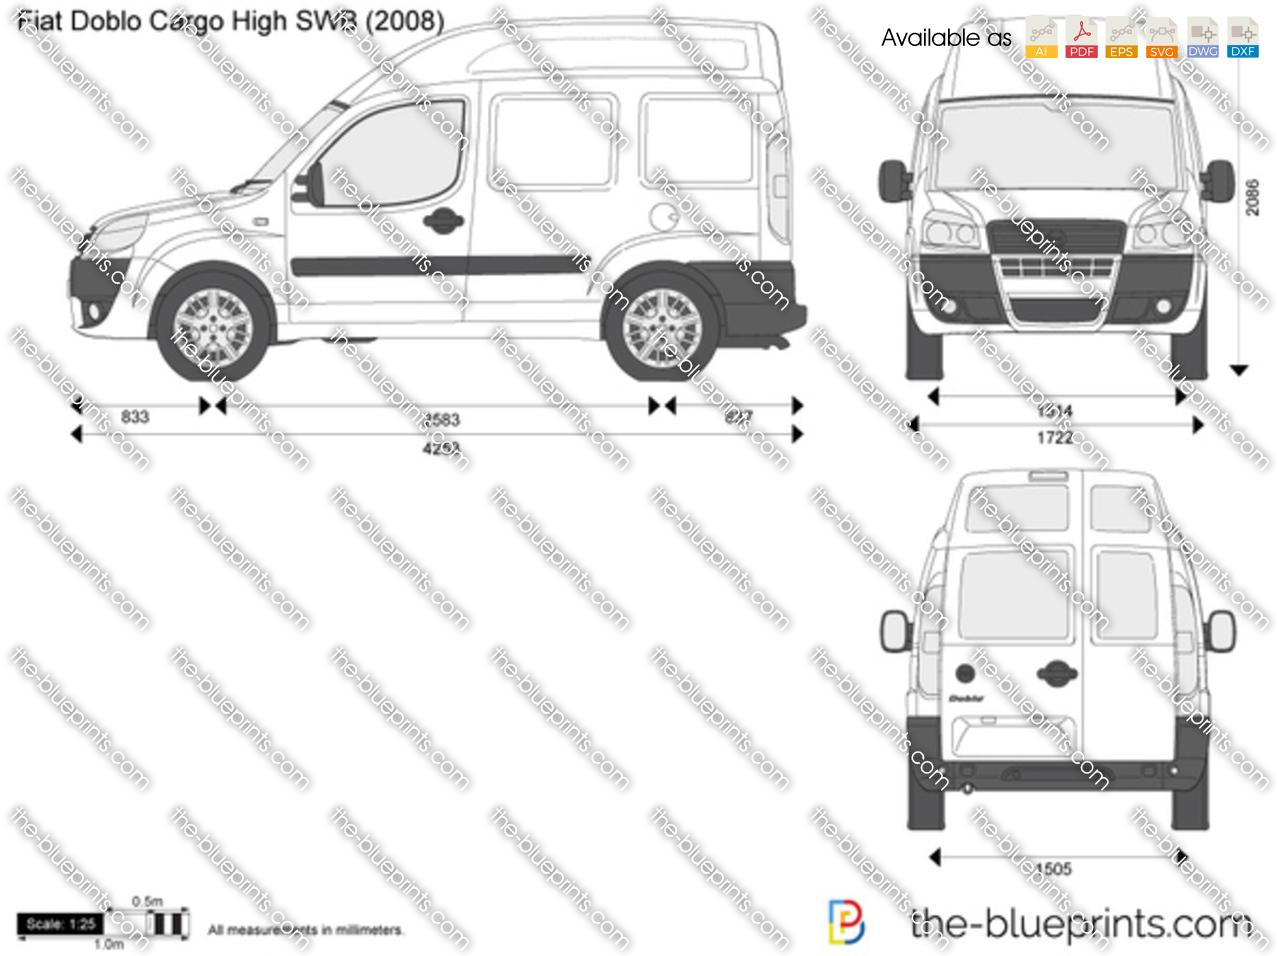 Wrg 7265] fiat ducato van wiring diagram 2007 ducati monster s2r 800 fiat doblo cargo wiring diagram somurich com fiat doblo camper fiat doblo van wiring diagram